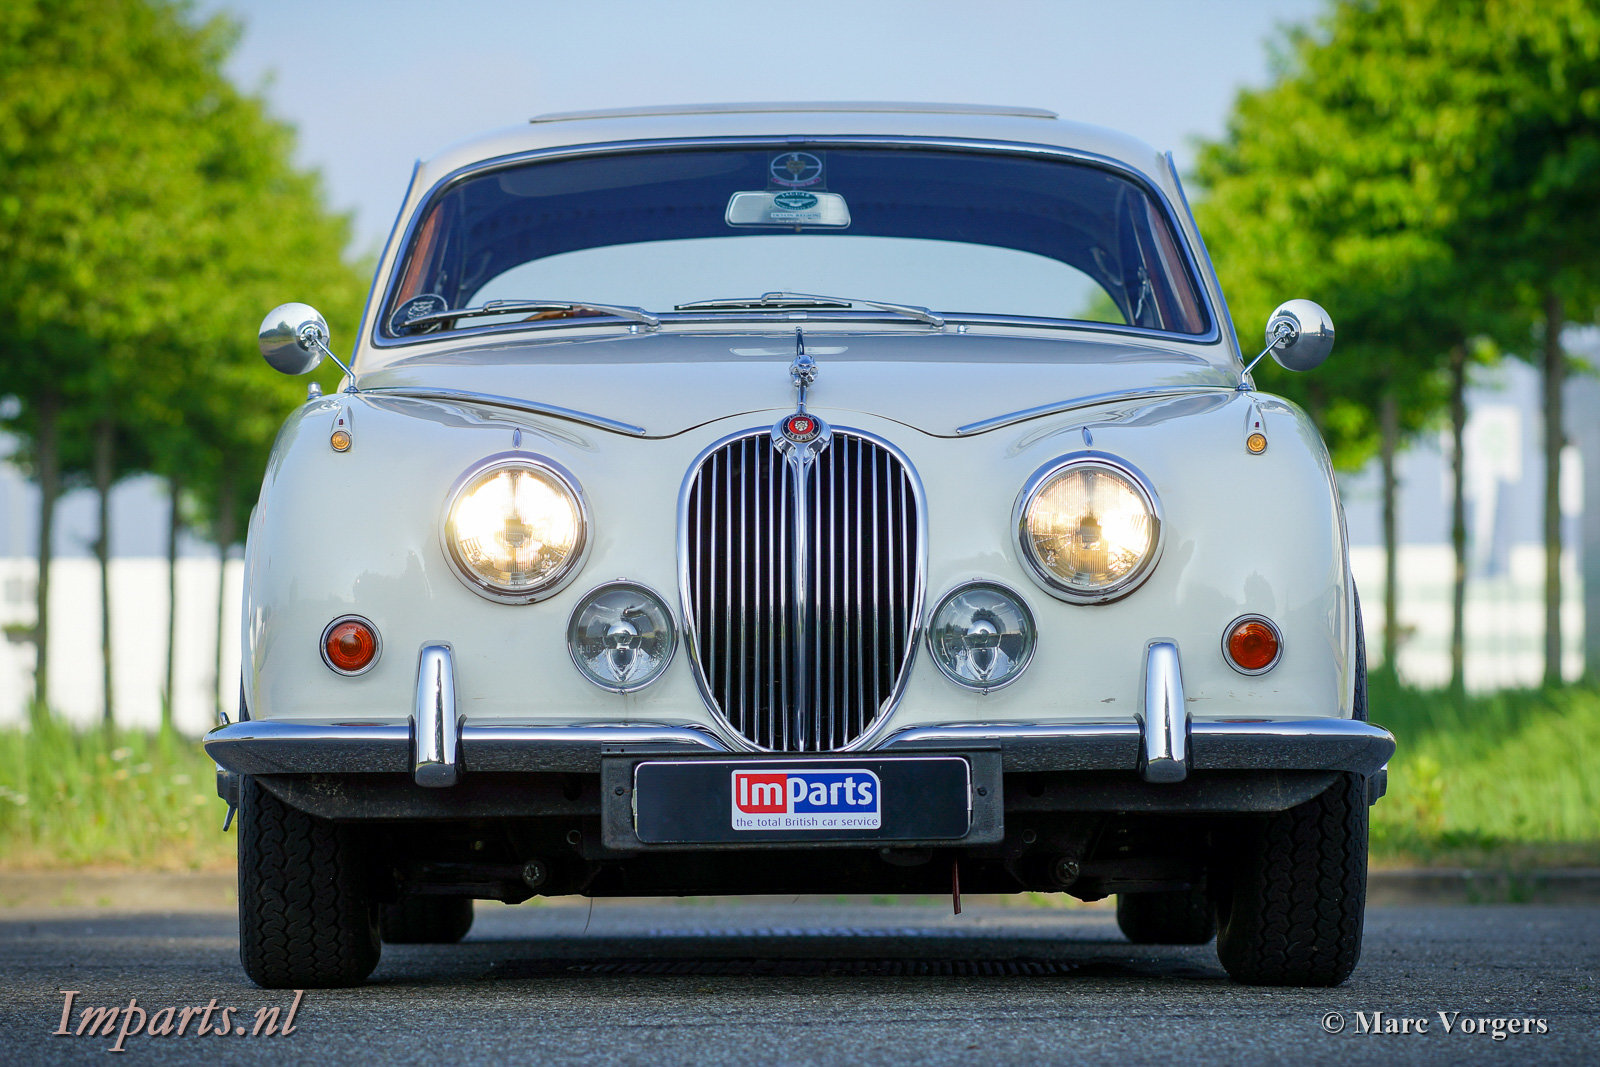 Jaguar Mk2 (240) manual Overdrive 1968 For Sale | Car And ...